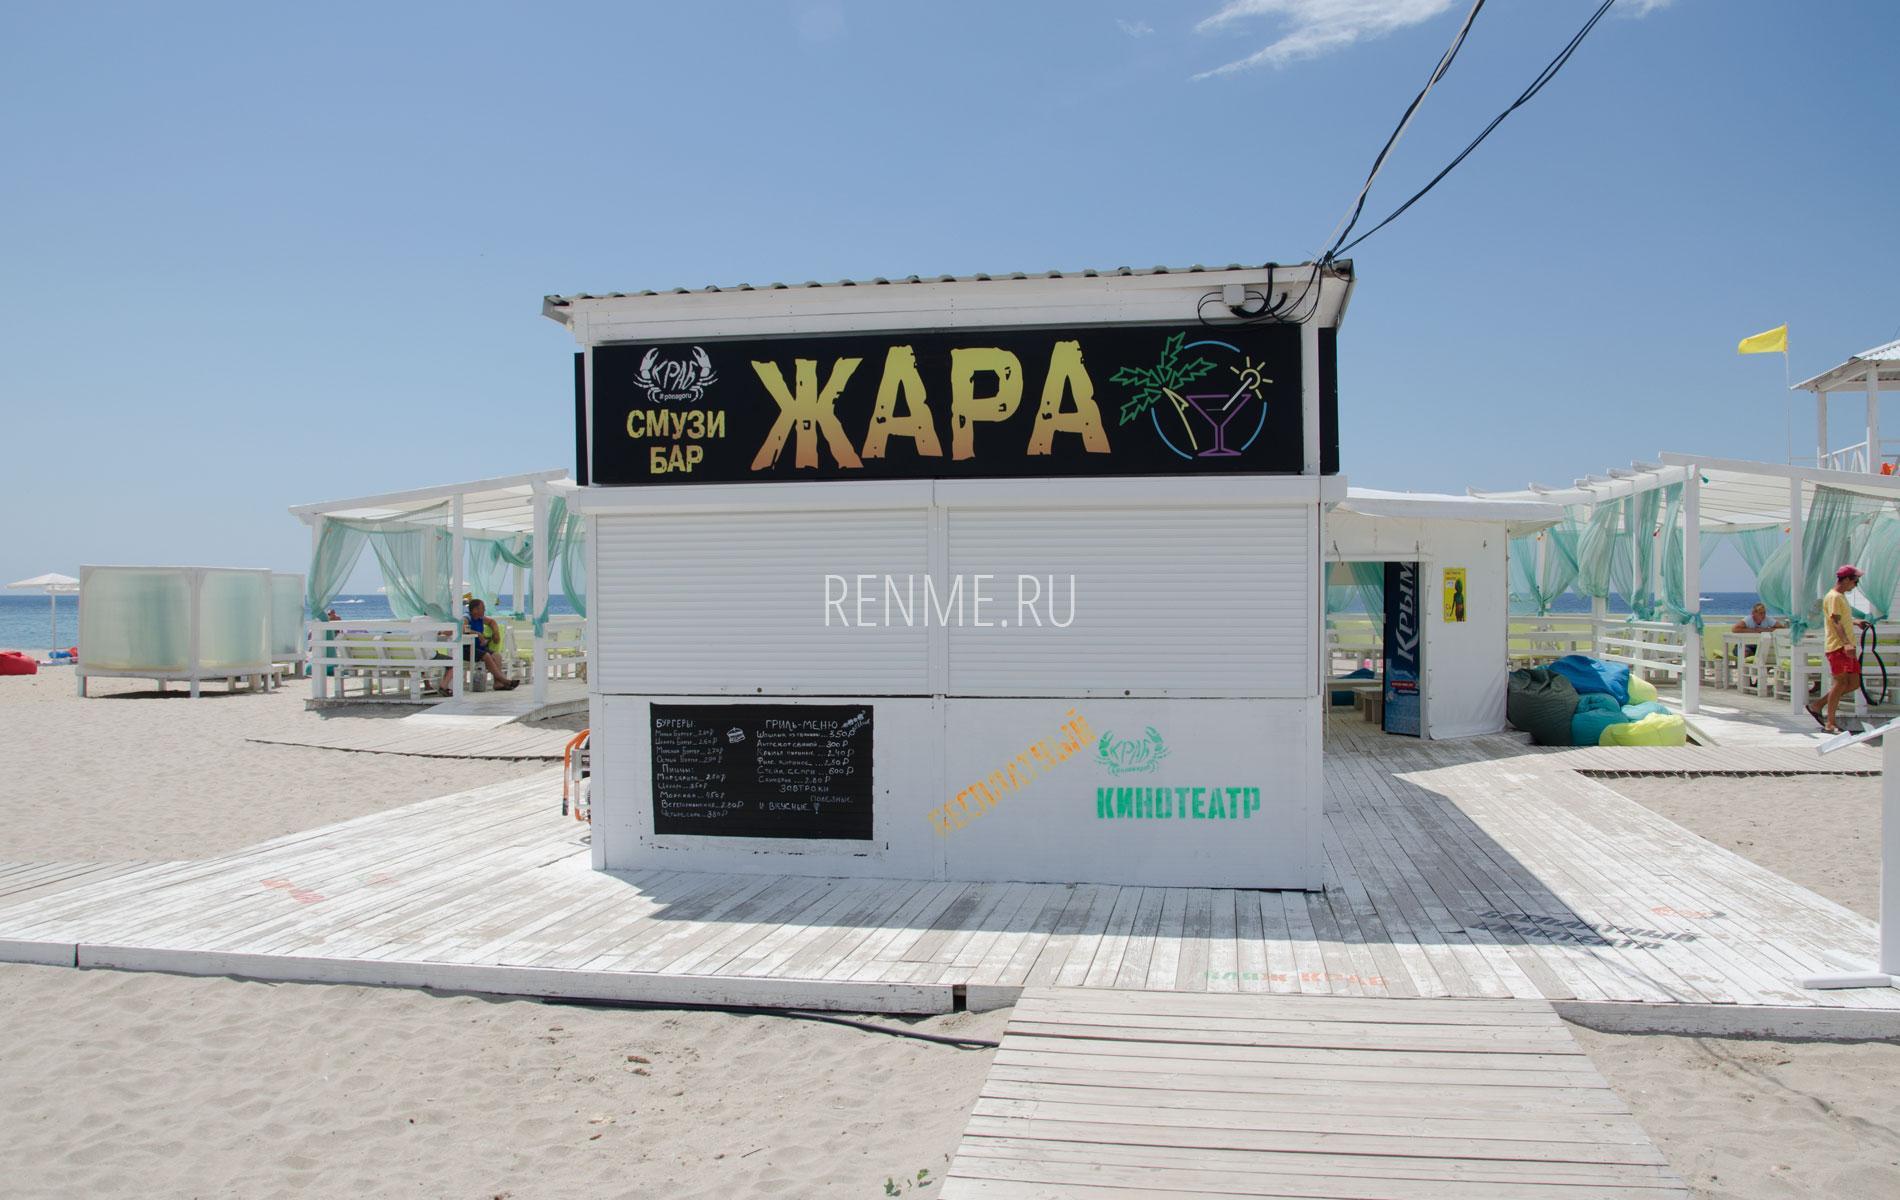 "Смузи бар ""Жара"" + кинотеатр. Фото Штормового"